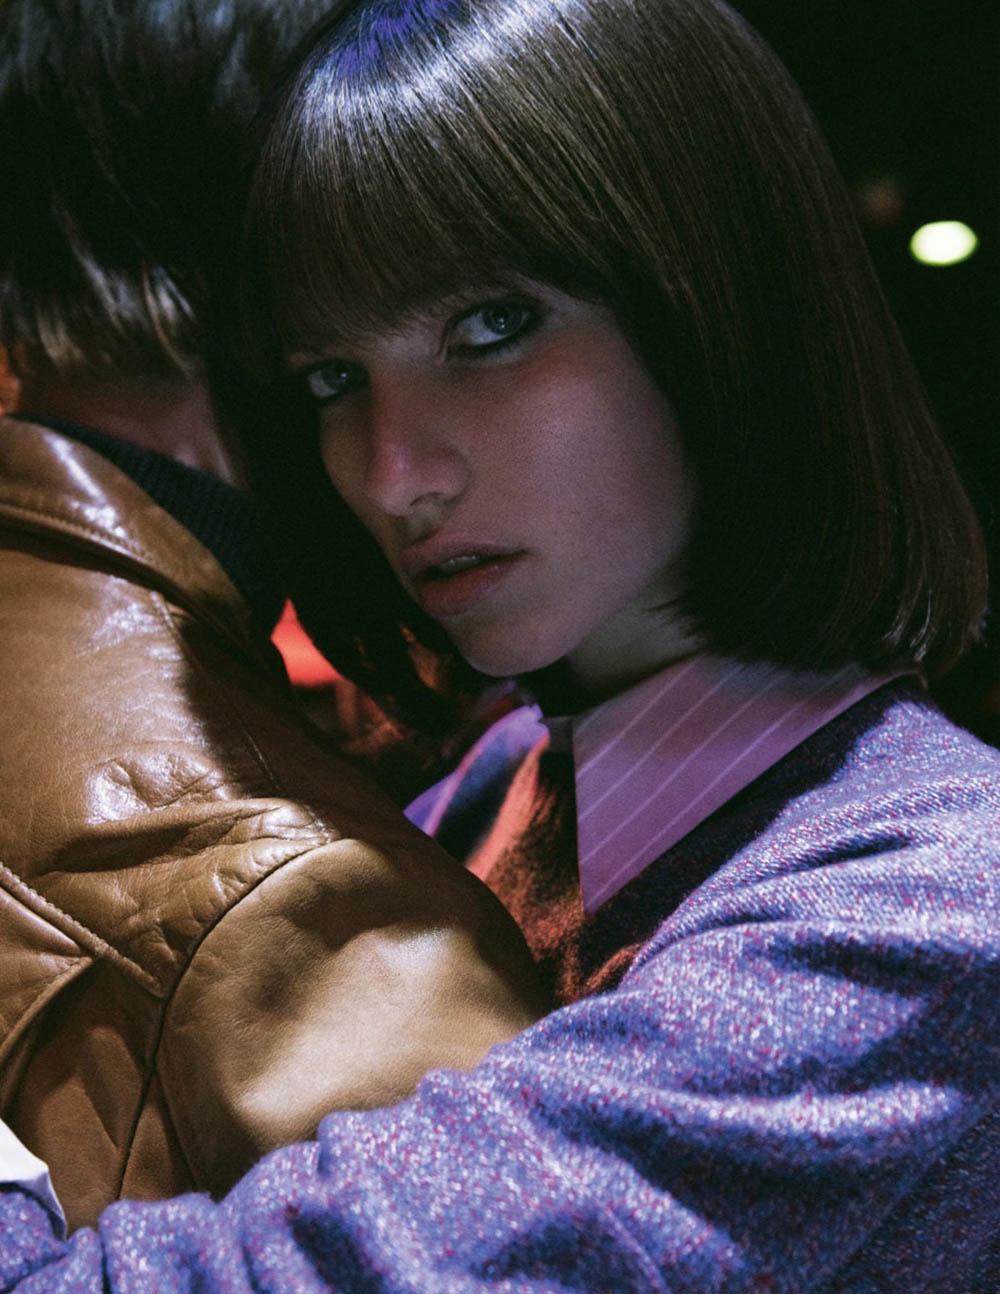 Grace Hartzel by Claudia Knoepfel for Vogue Paris May/June 2020